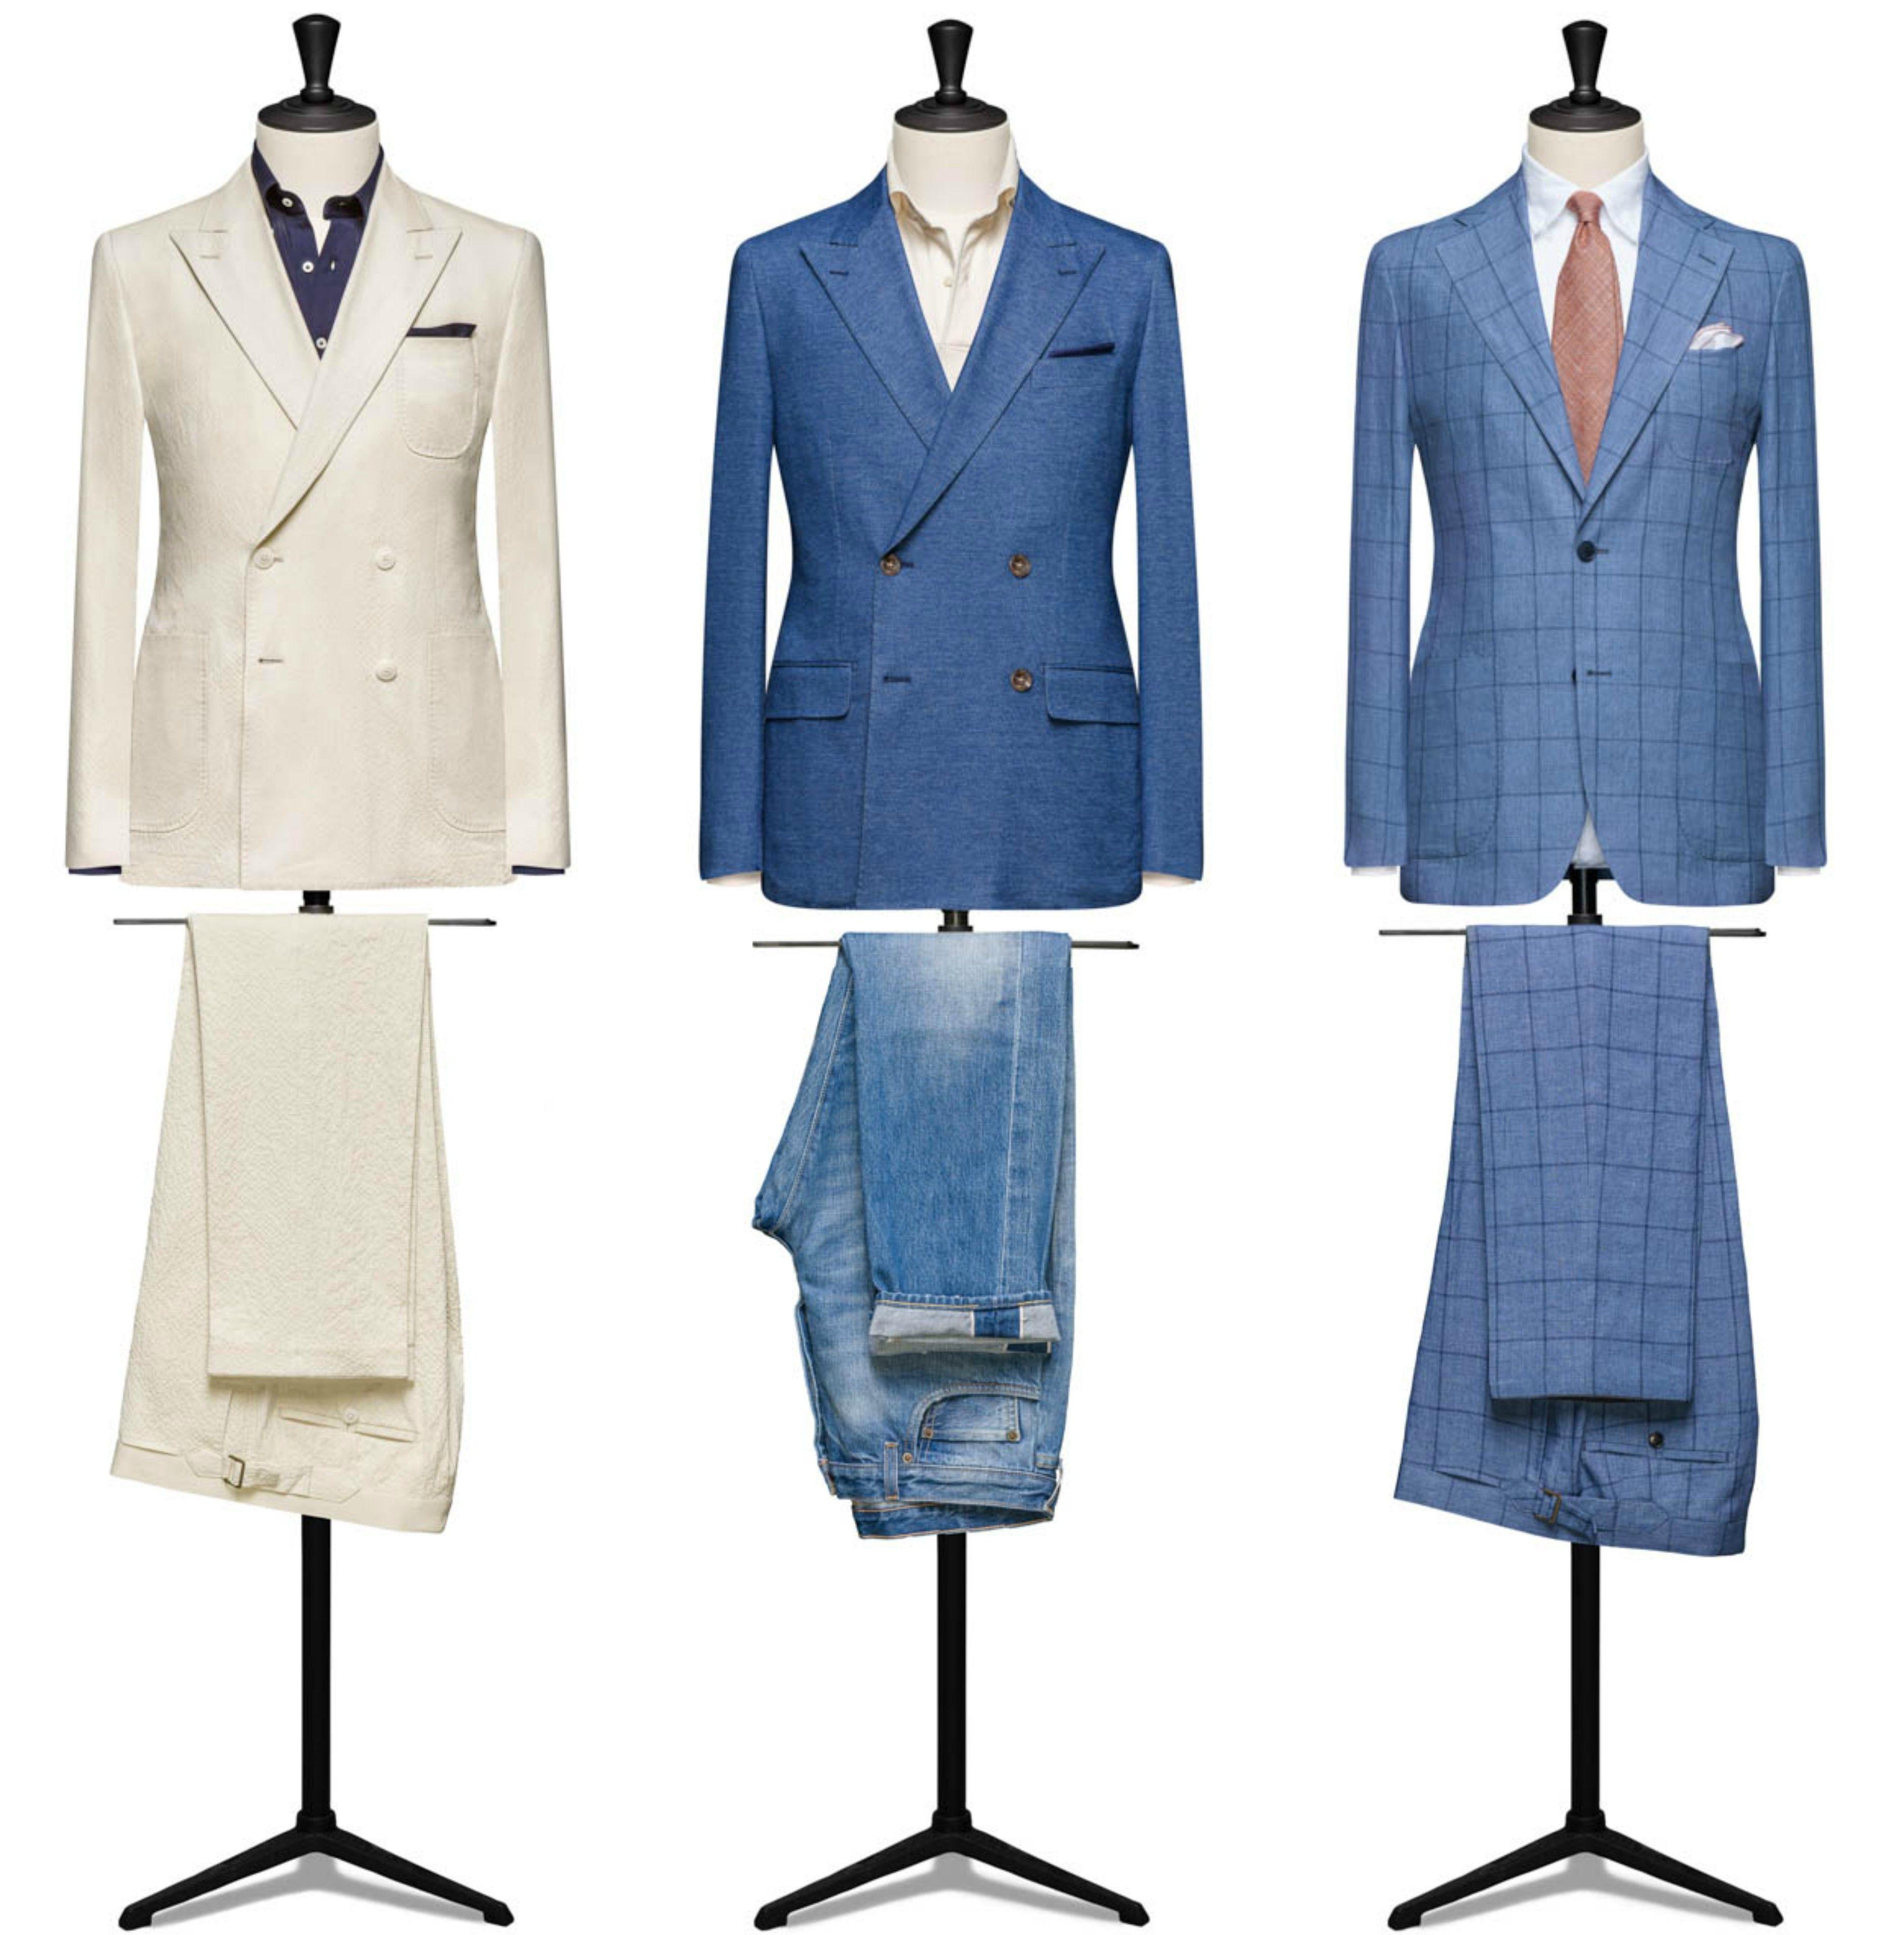 fabrics to choose for the summer season | My board | Pinterest ...